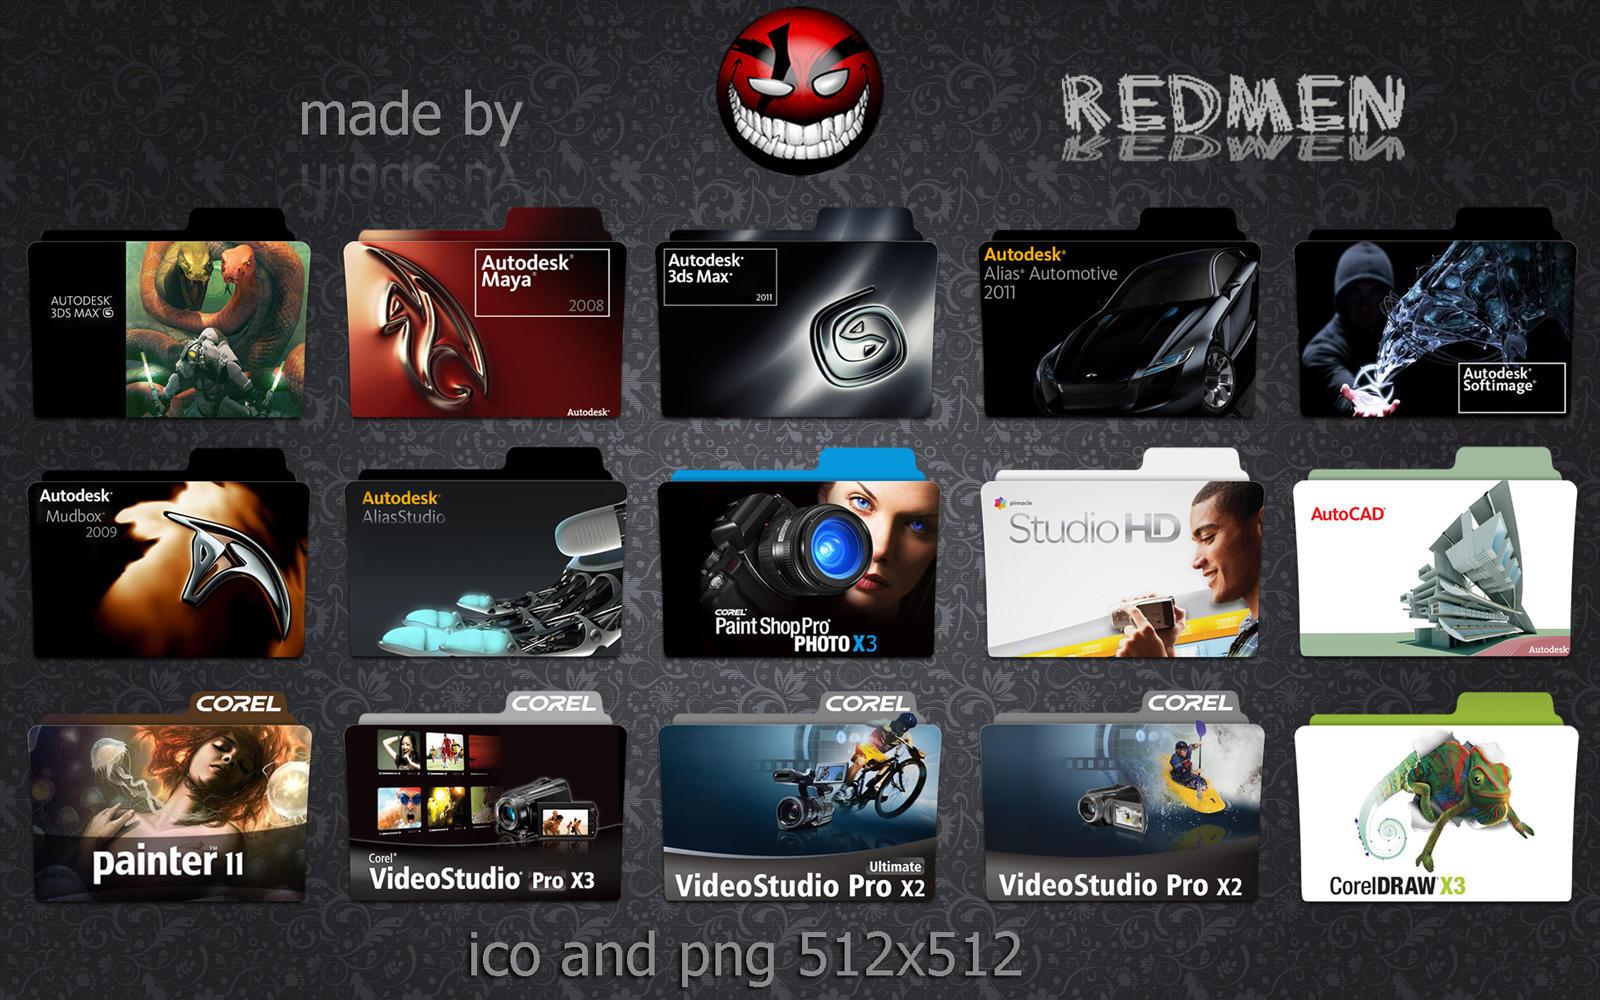 Programm pack 5 by redmen08